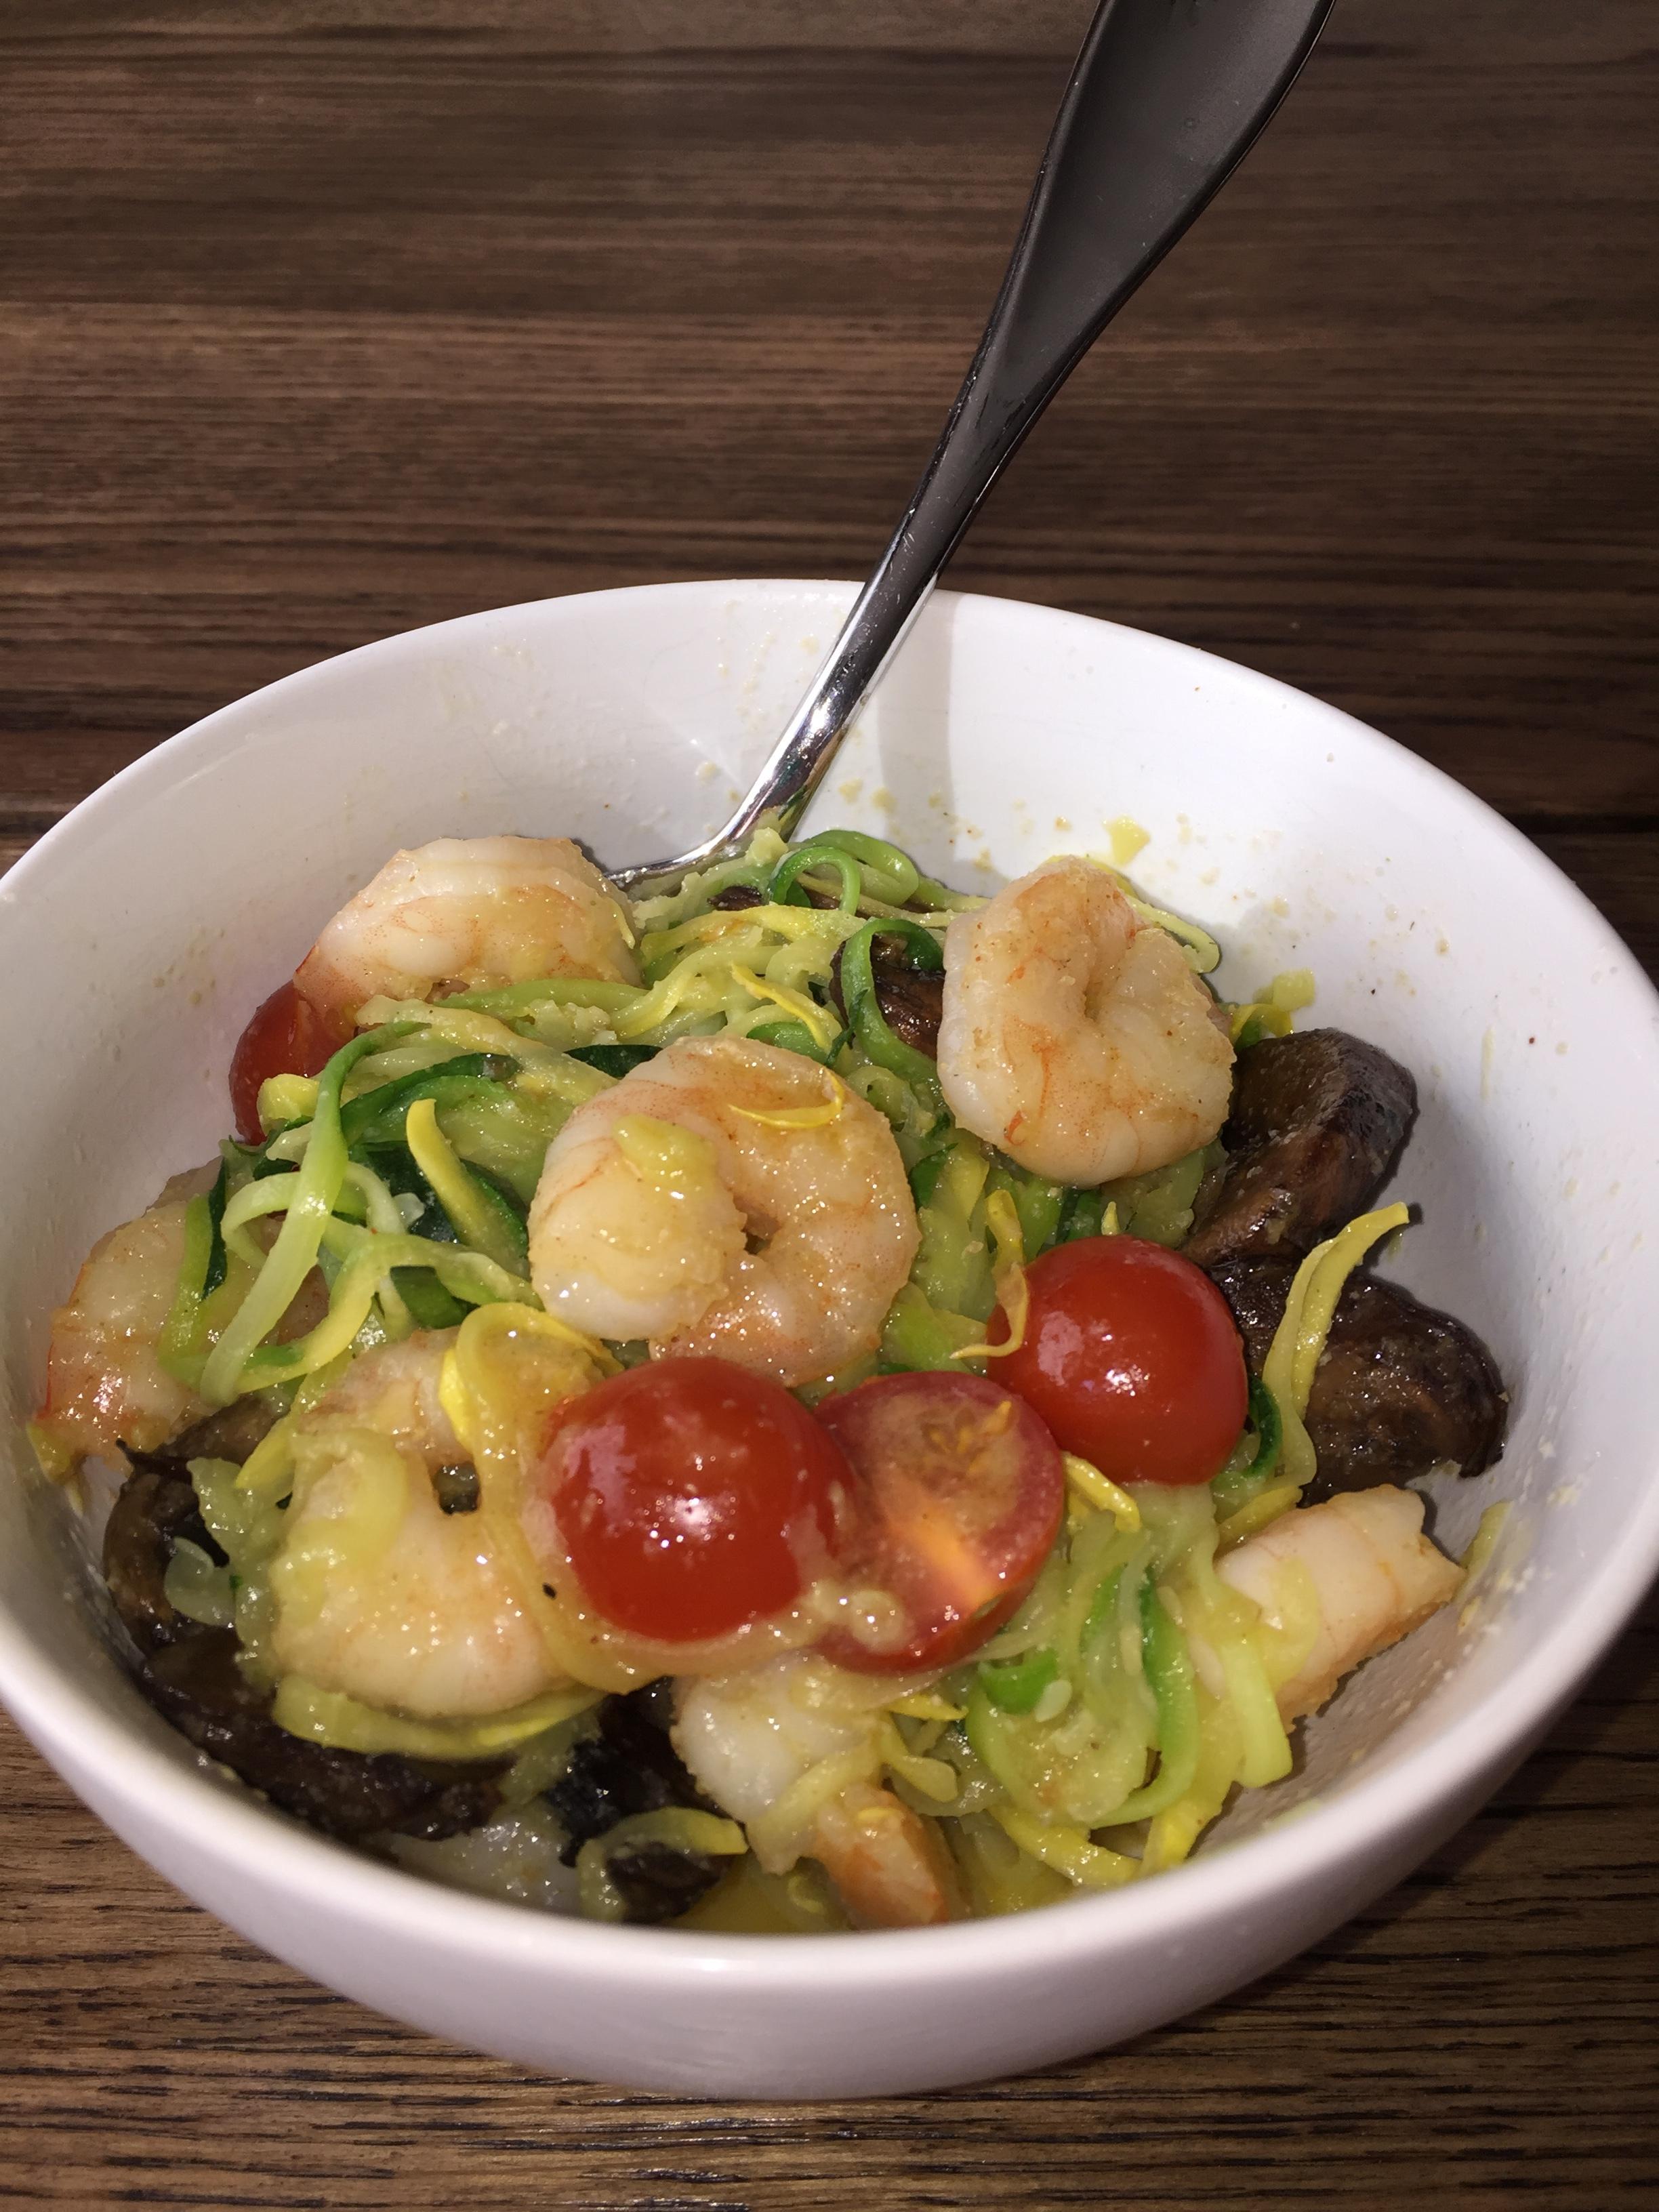 Rceipe for basal garlic shrimp pasta